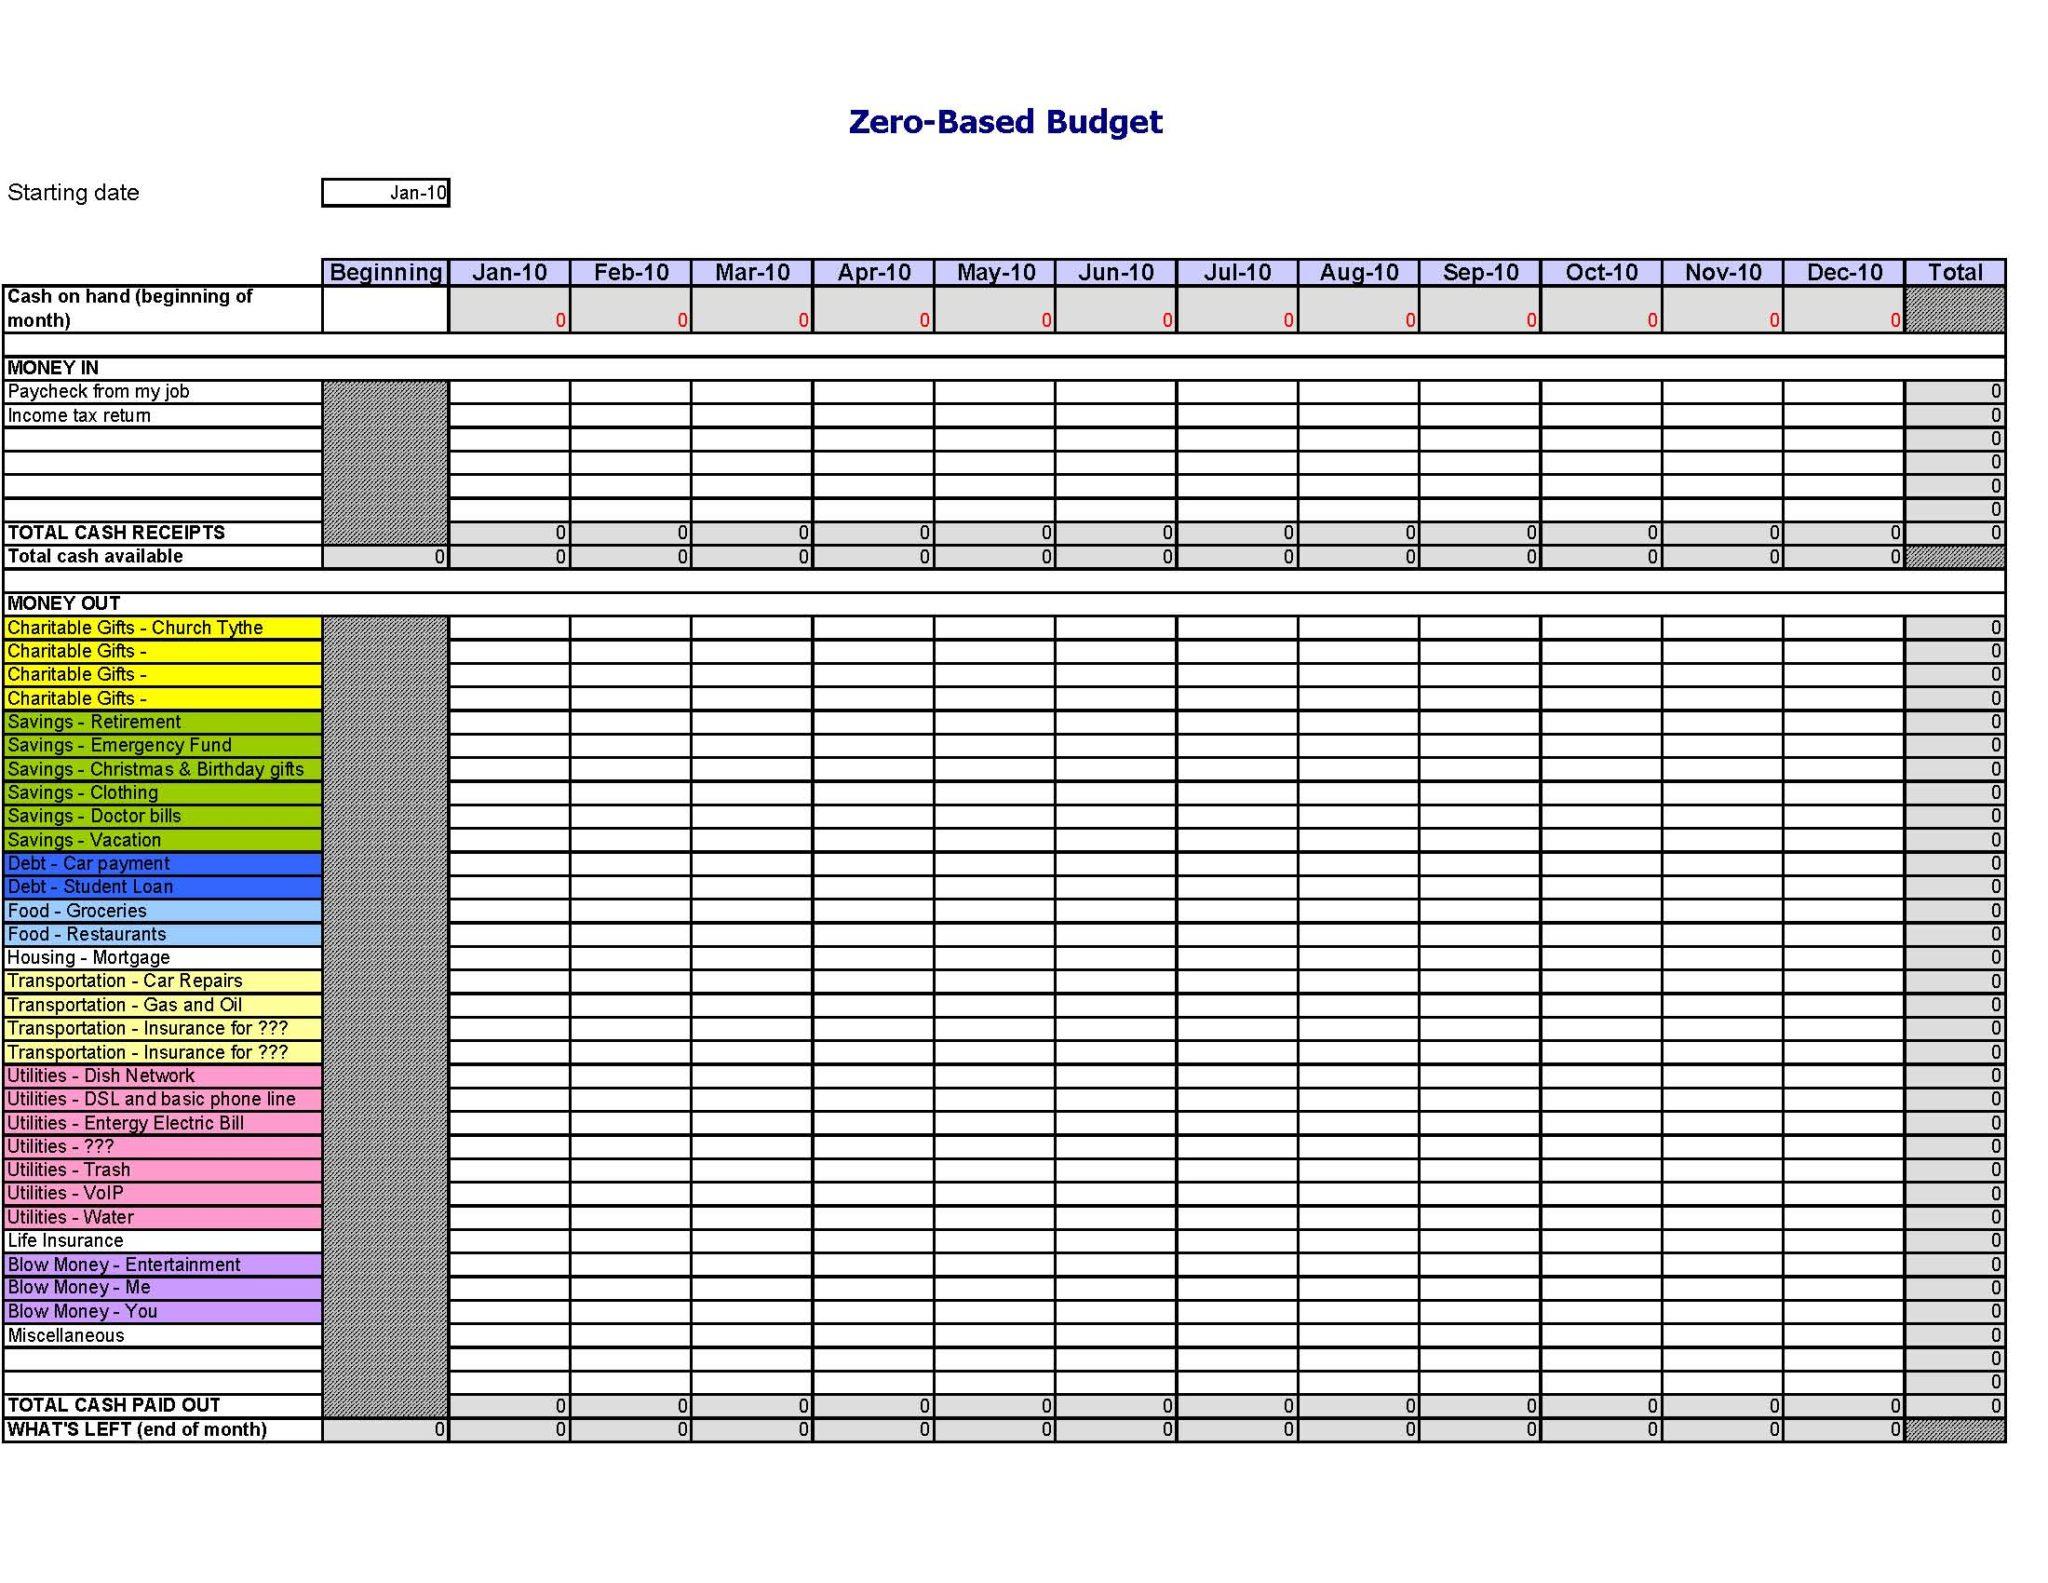 Information Technology Budget Categories